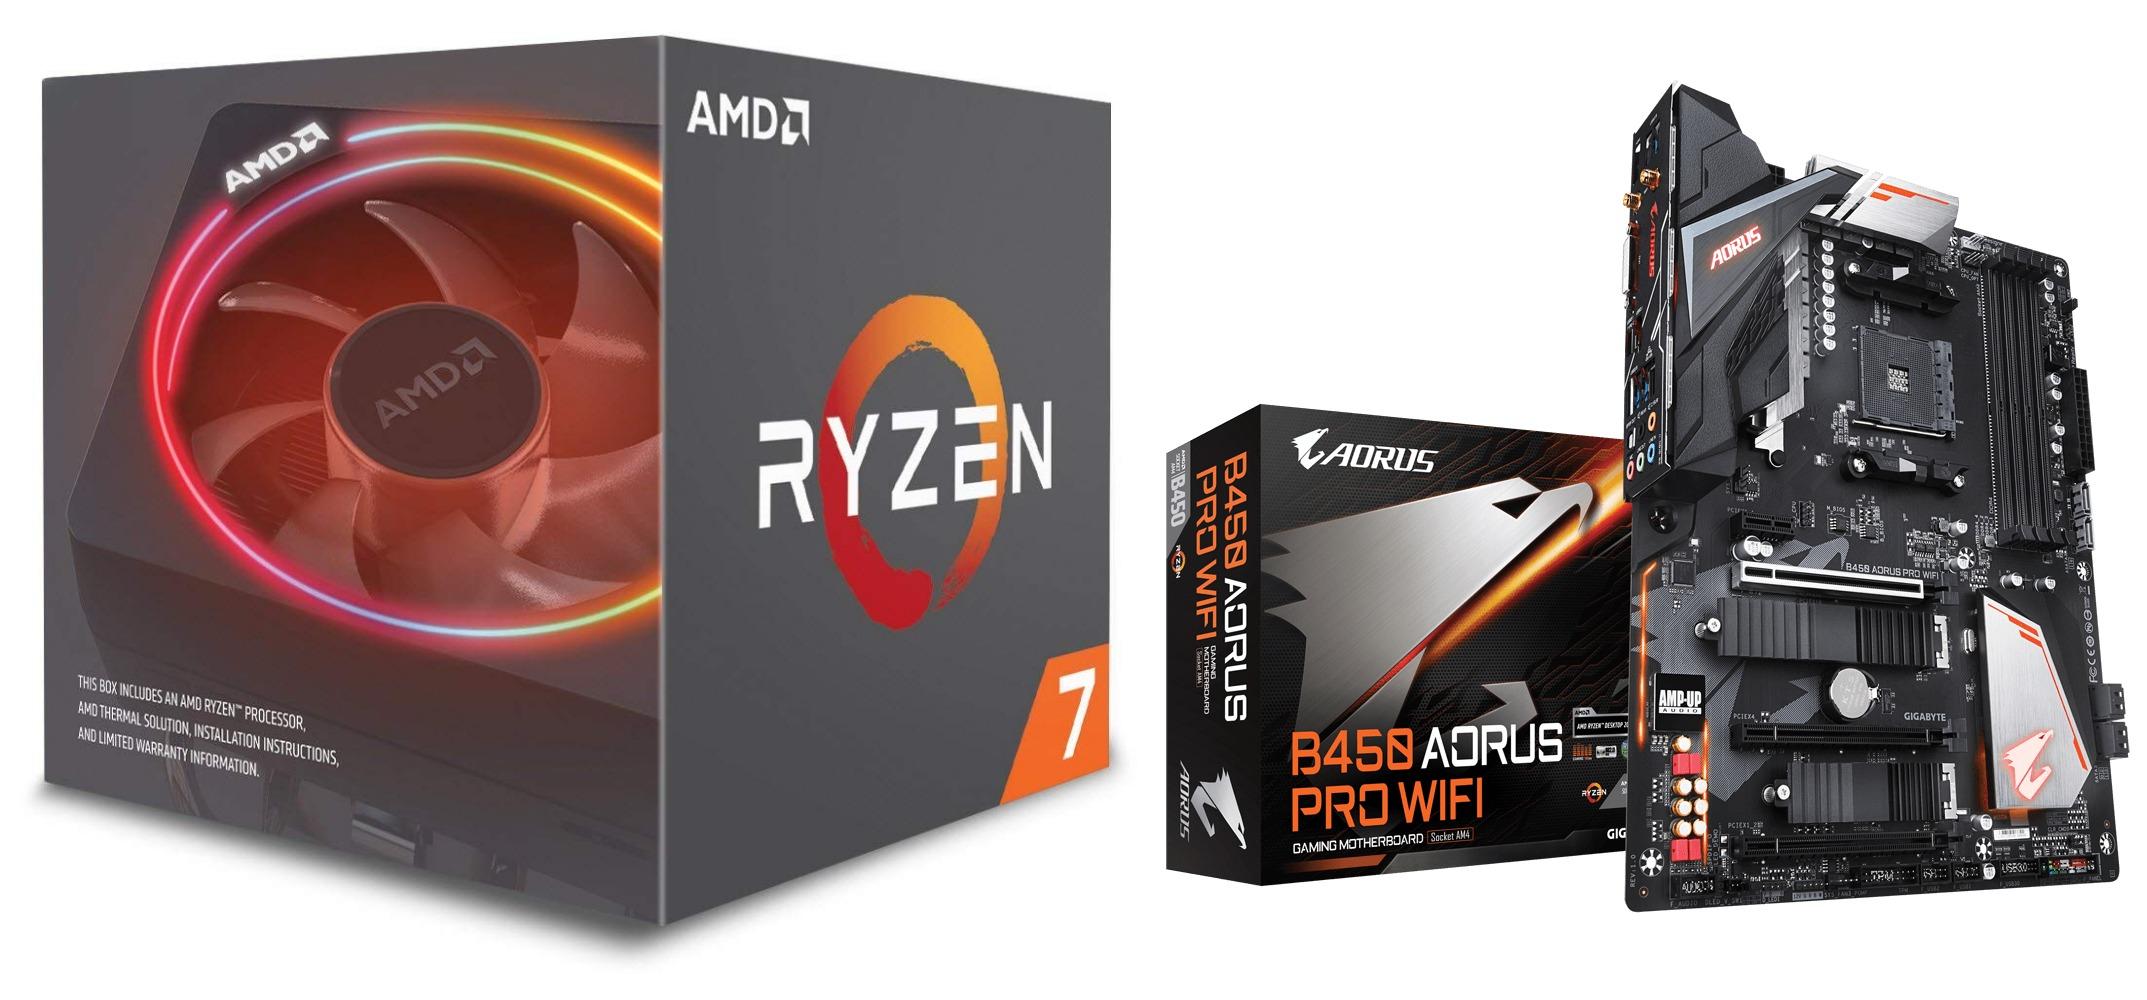 AMD Ryzen 7 2700X PROCESSOR BUNDLE with Gigabyte B450 AORUS PRO WIFI  MOTHERBOARD